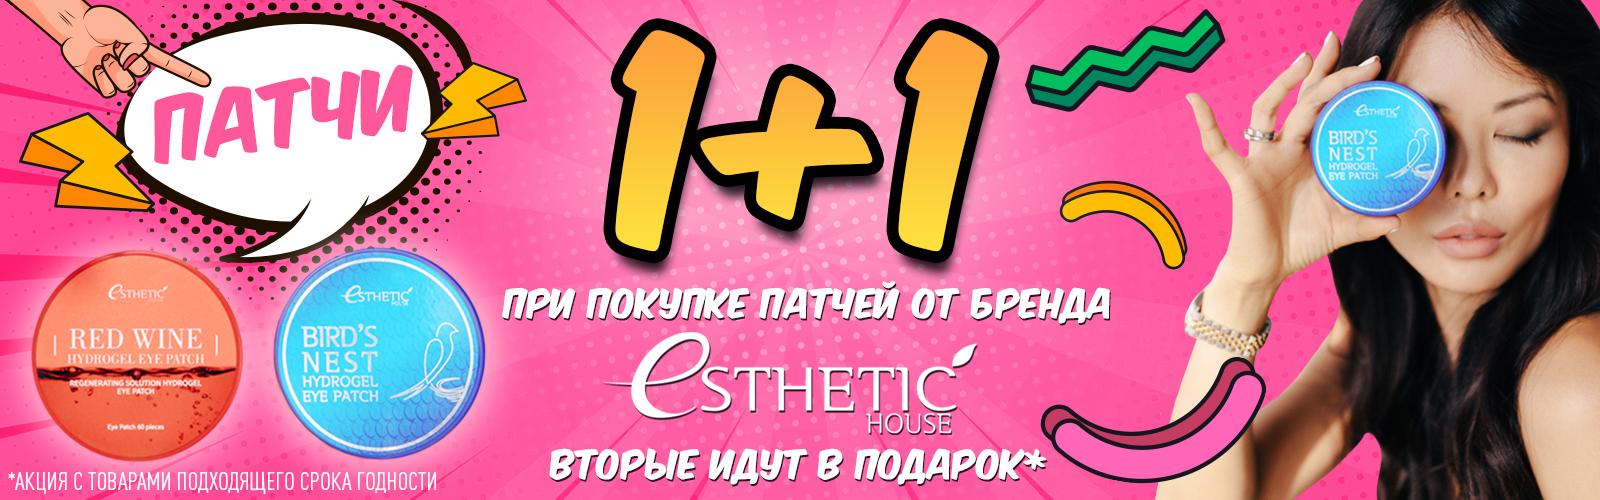 Акция на патчи Esthetic house 1+1